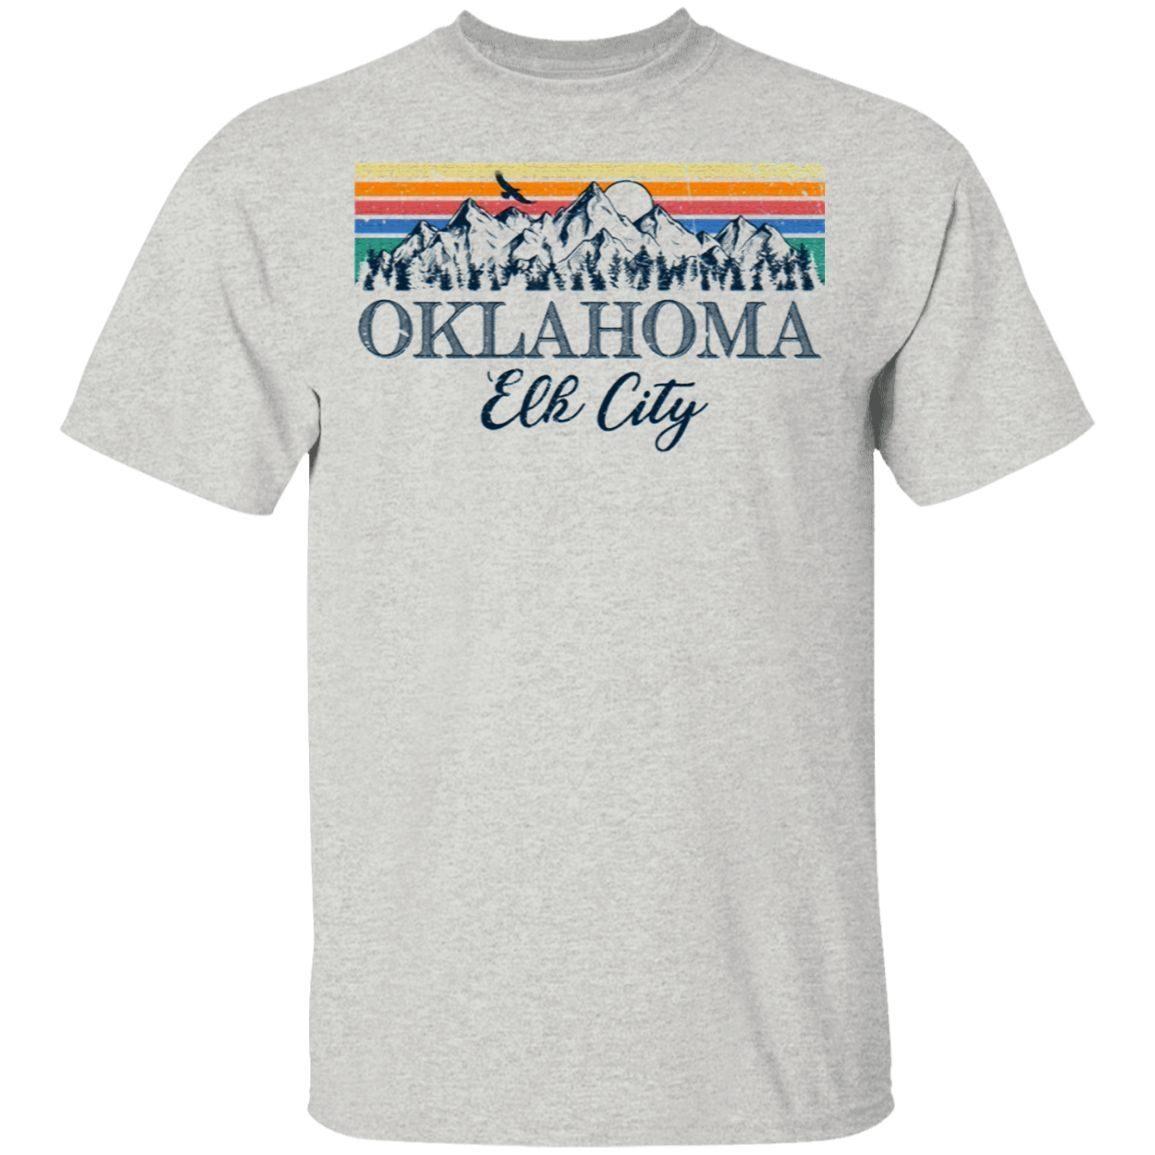 Elk City Oklahoma Retro Vintage Aesthetic T-Shirt